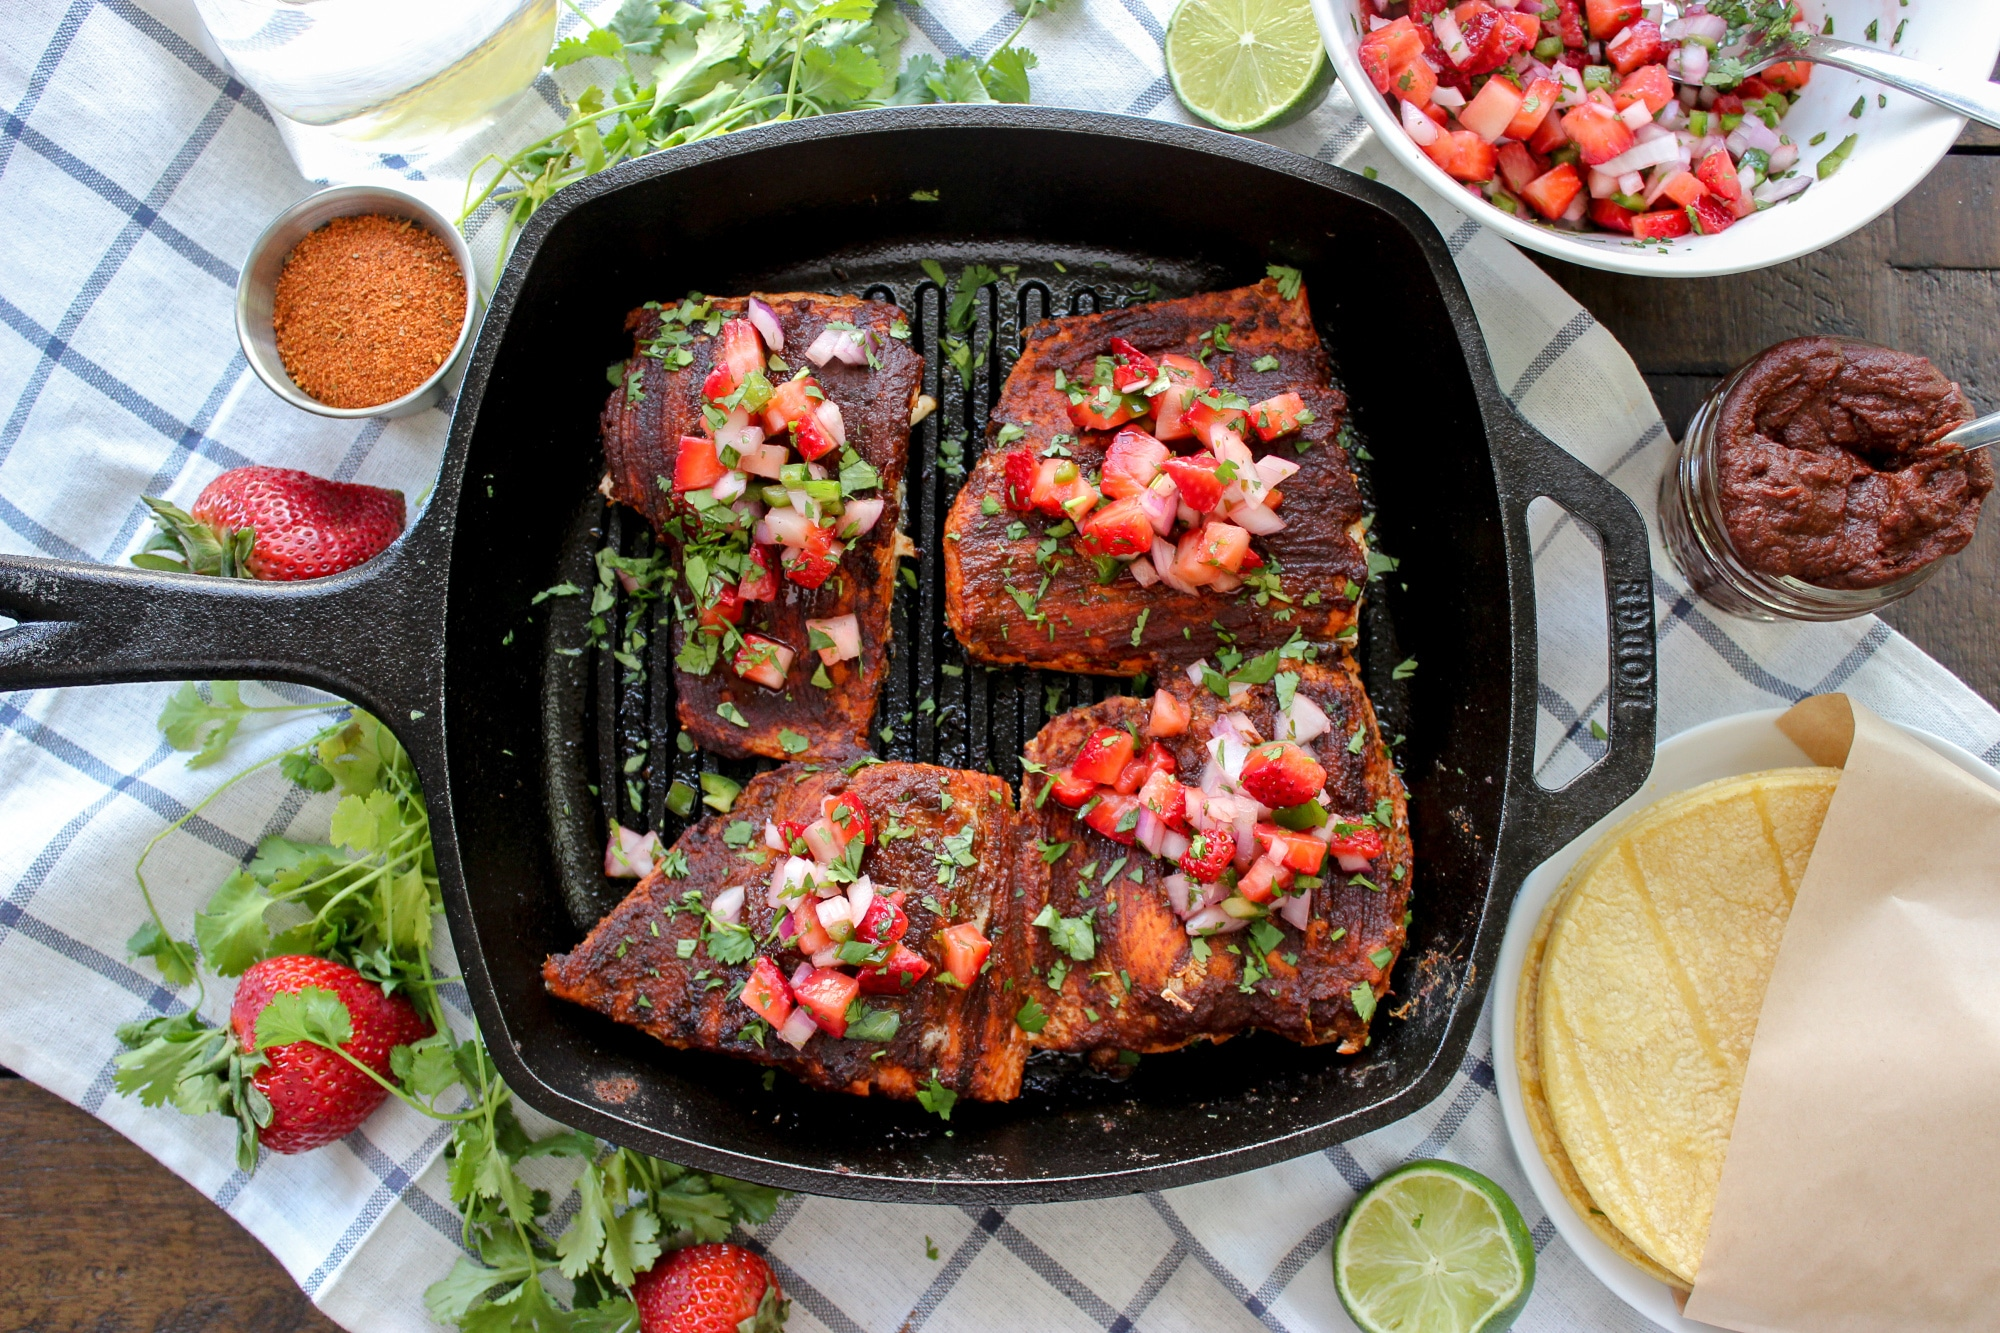 Blackened BBQ Salmon with Strawberry Salsa